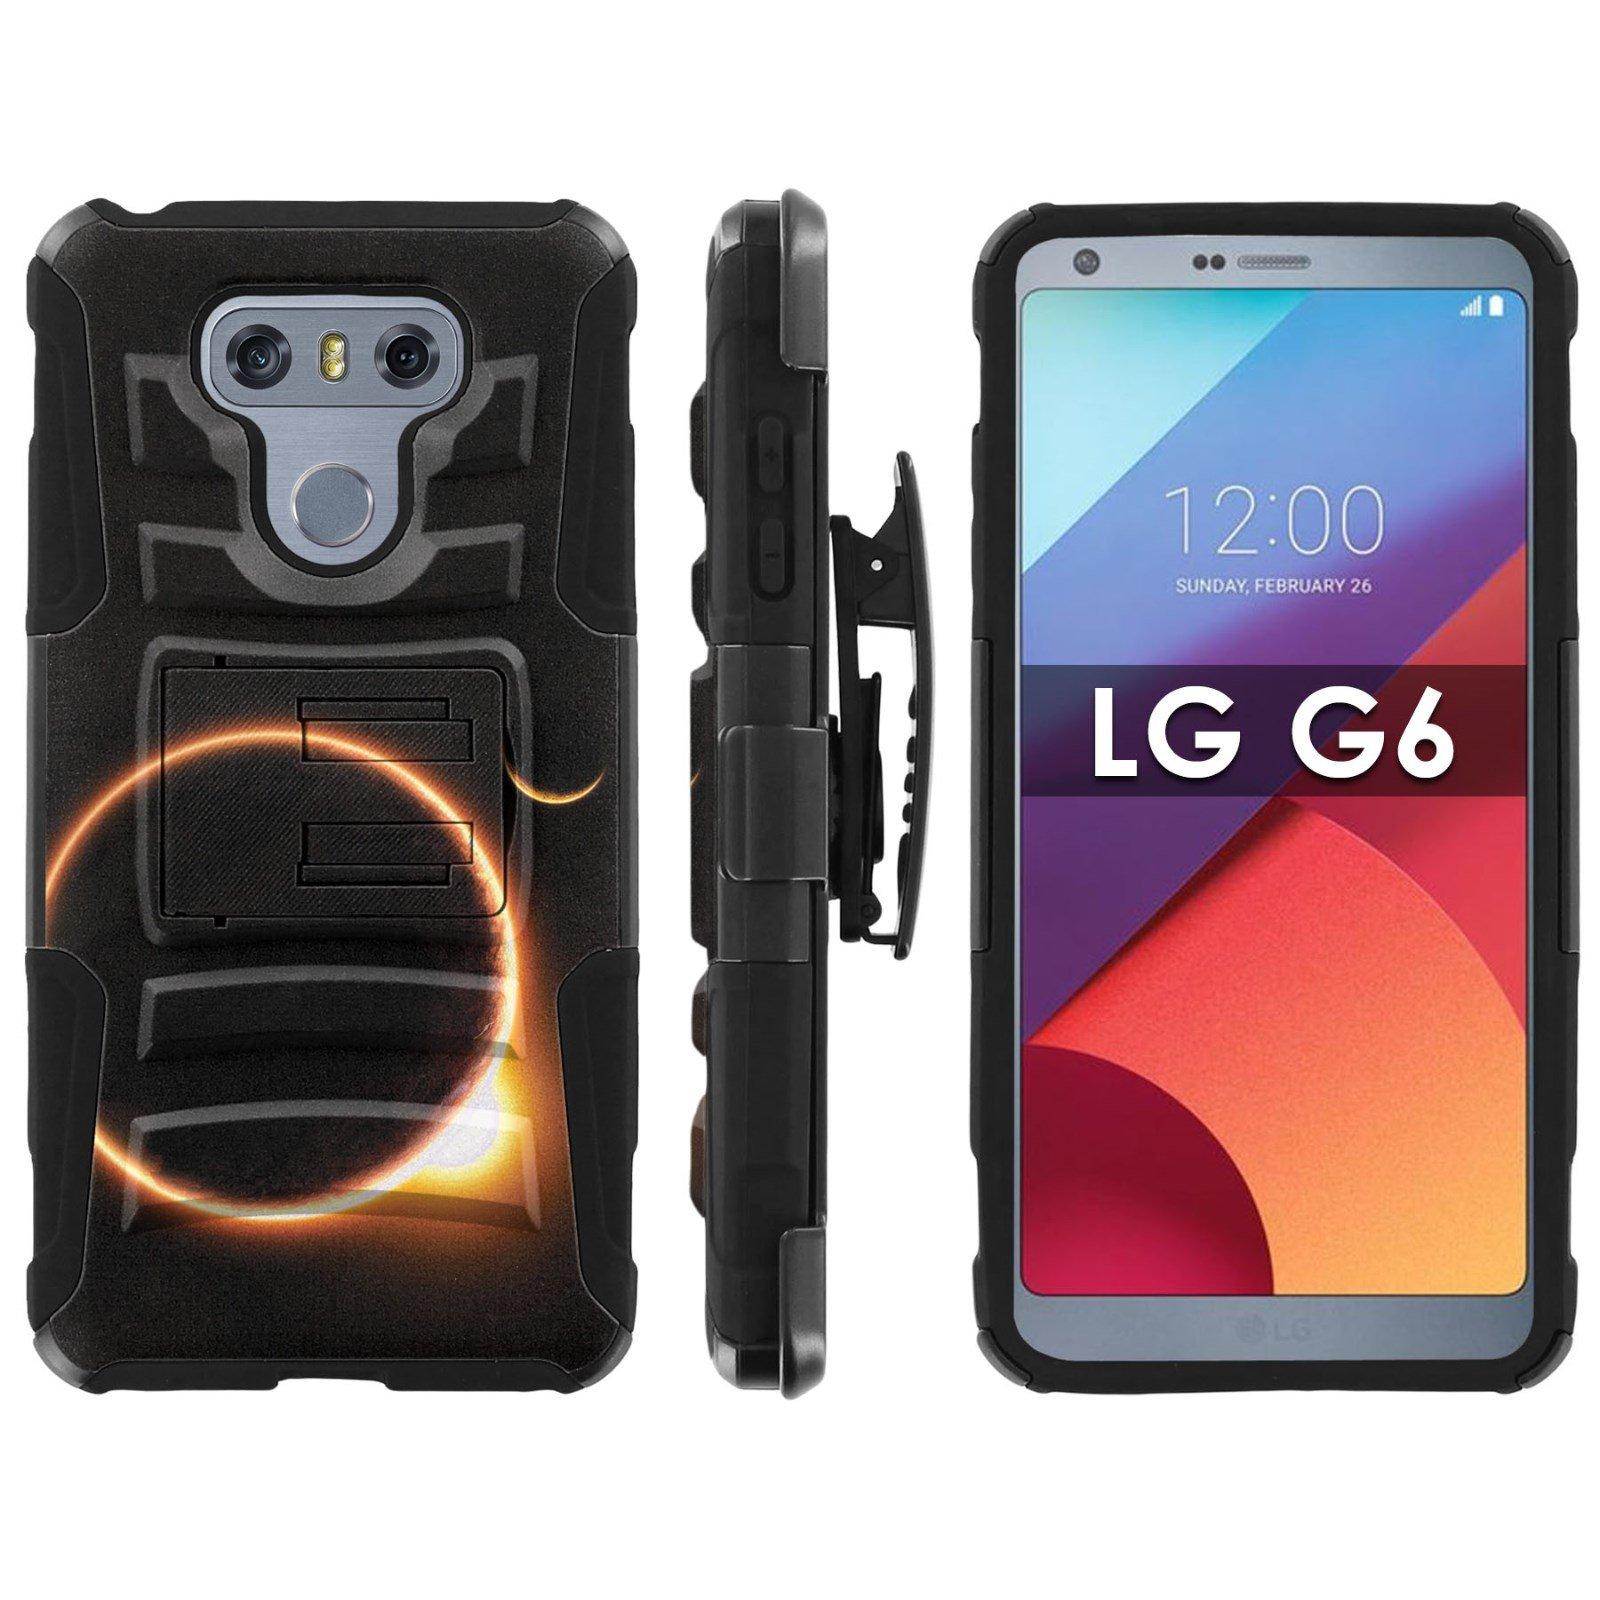 LG G6 Armor Case [Mobiflare] [Black/Black] Blitz Armor Phone Case with Holster - [Solar Eclipse]